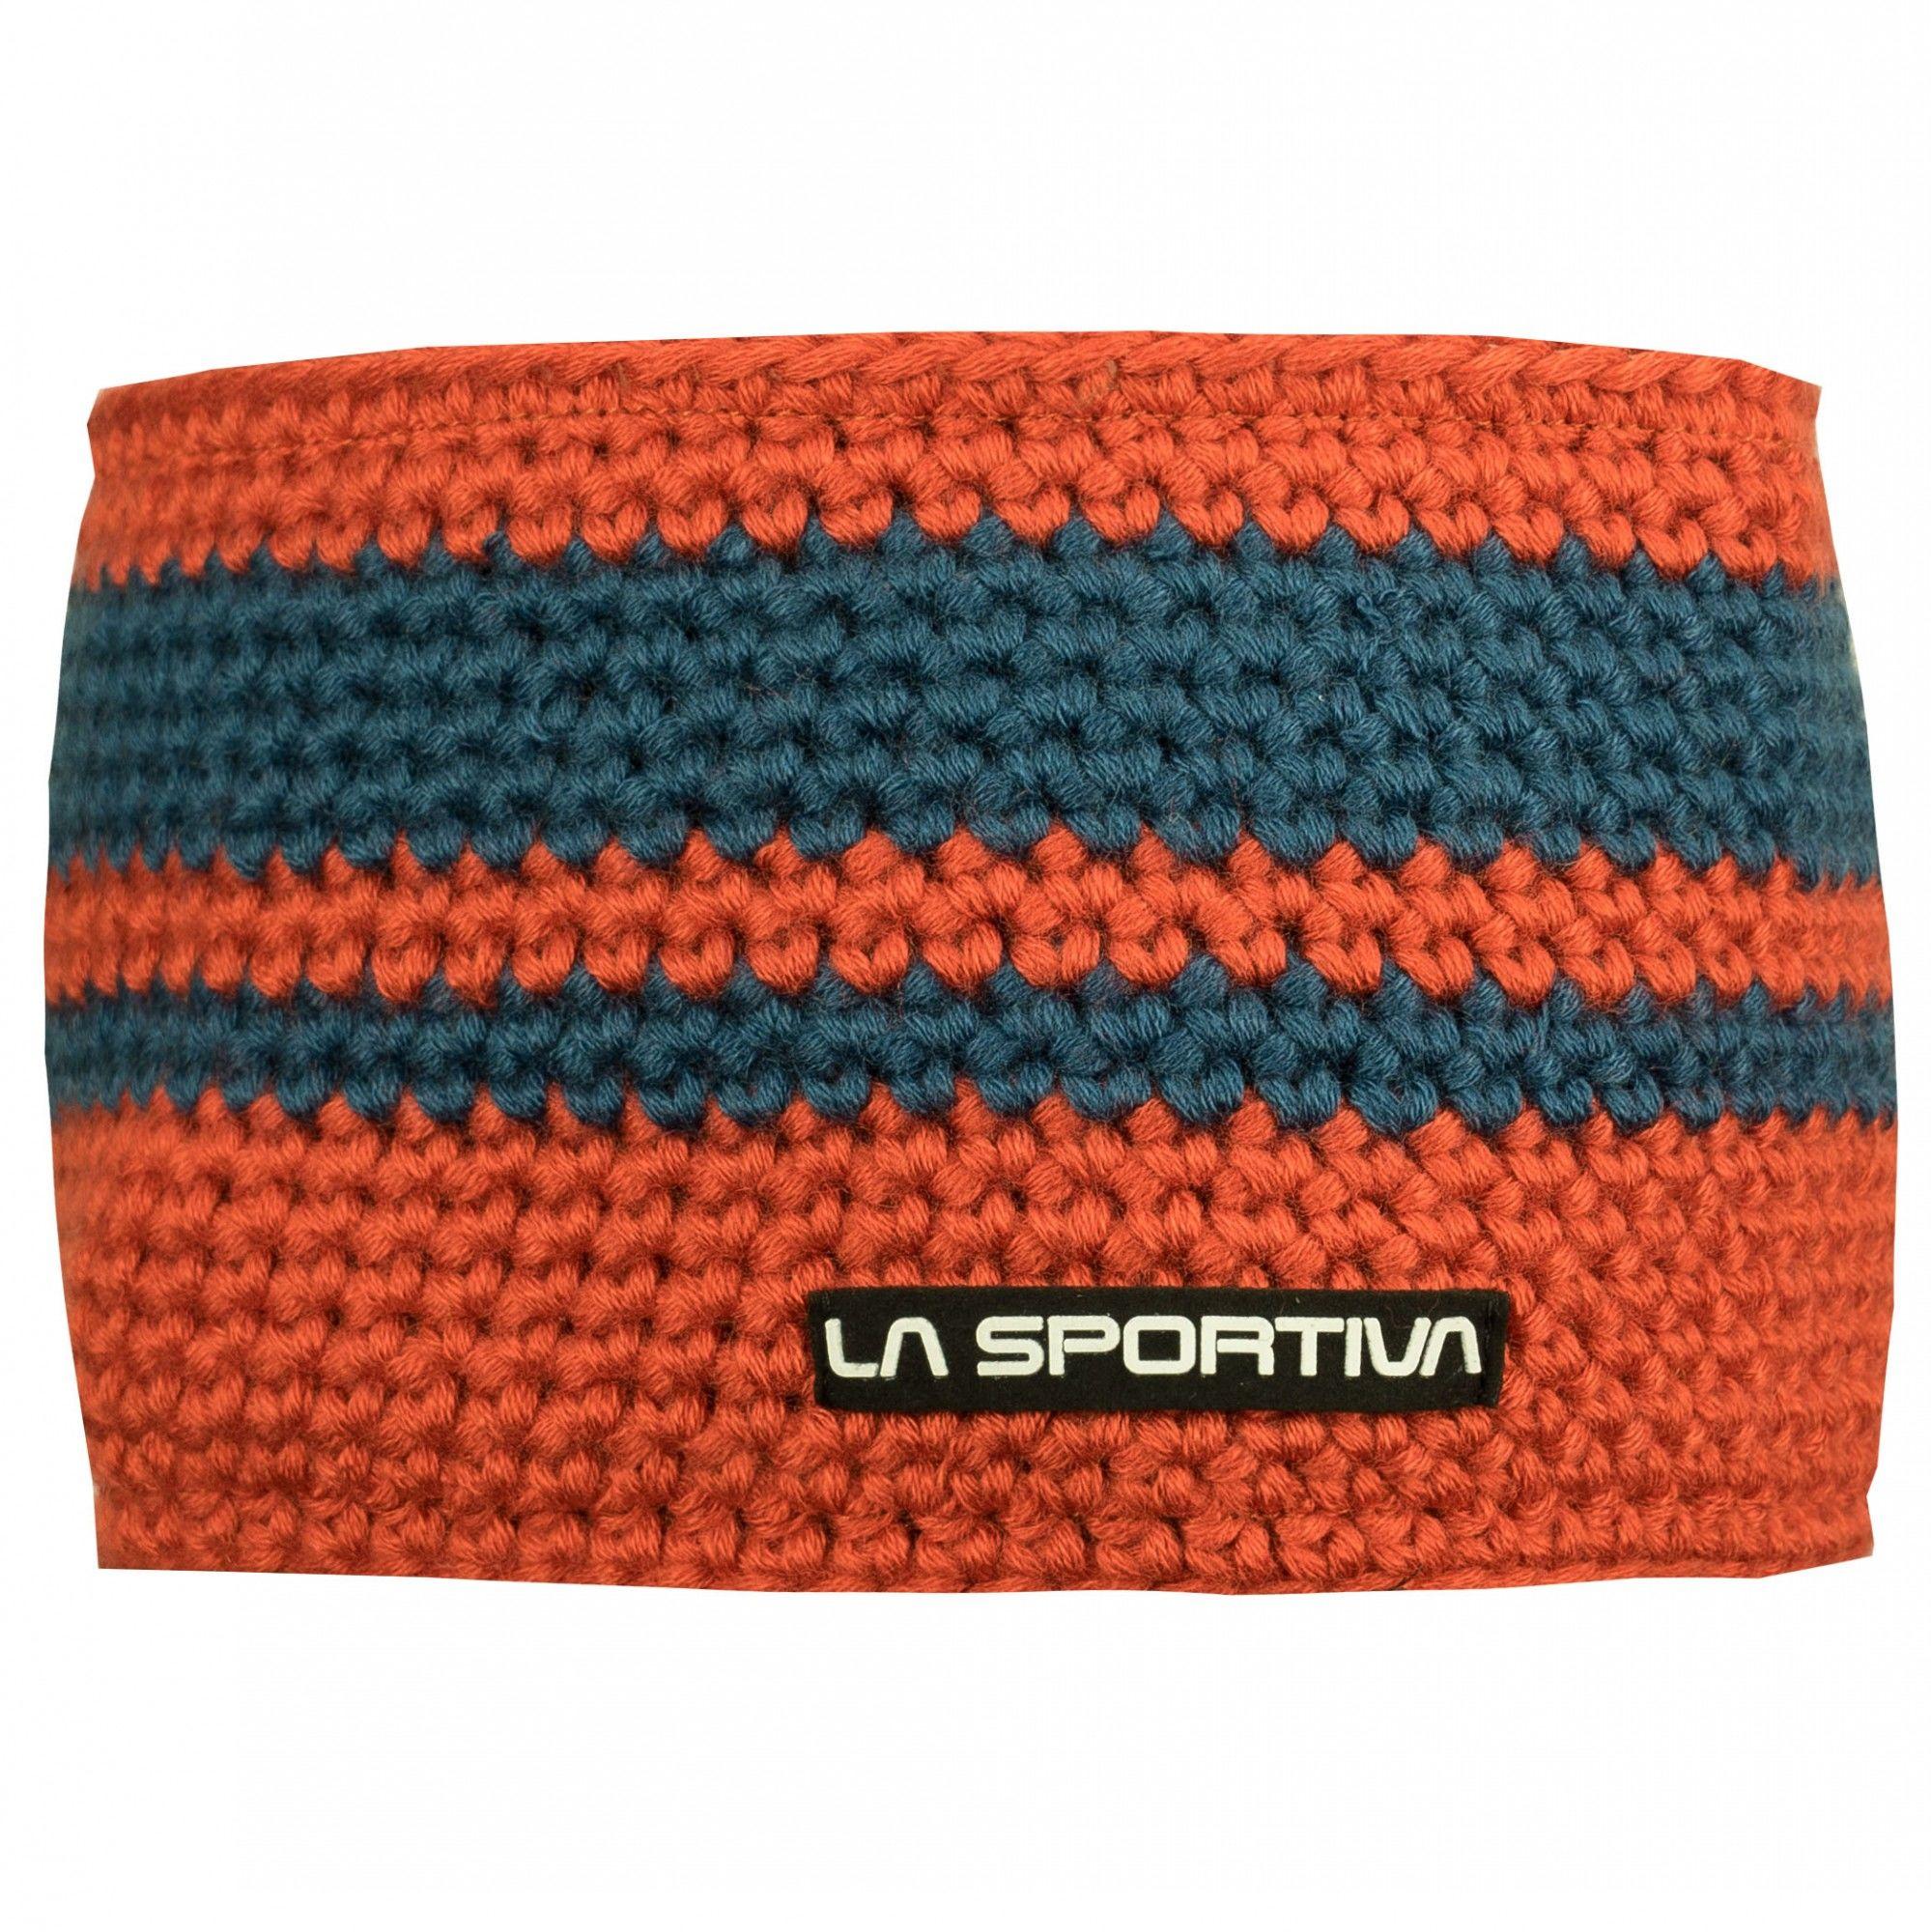 La Sportiva Zephir Headband Blau, Accessoires, S/M